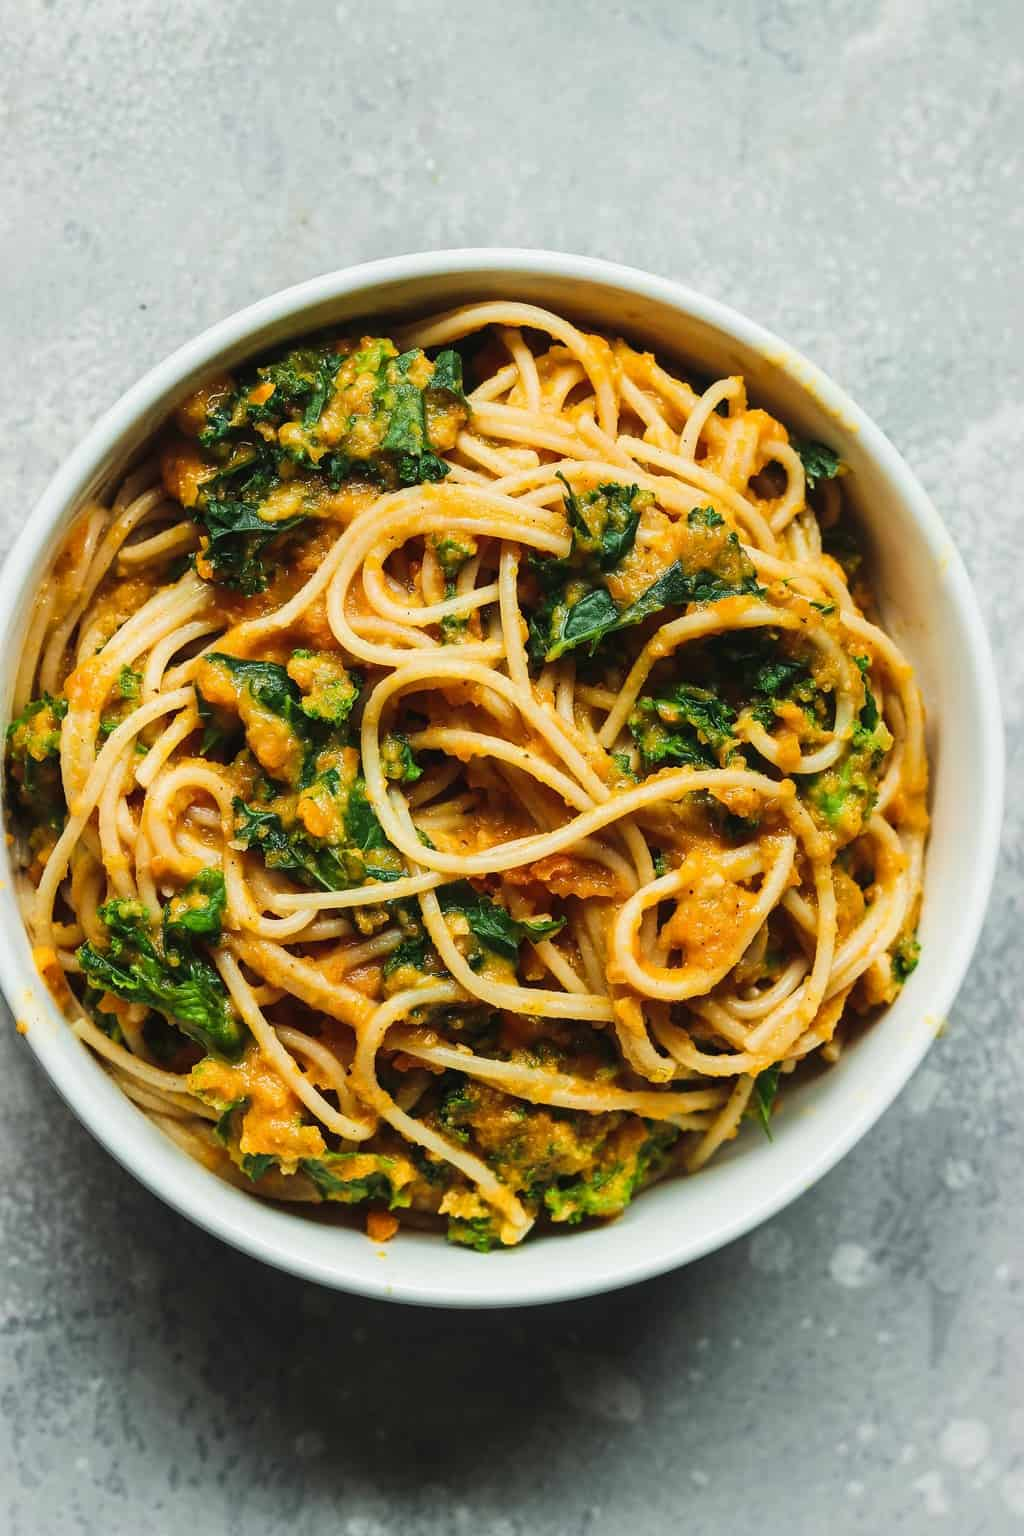 Vegan pasta in a white bowl